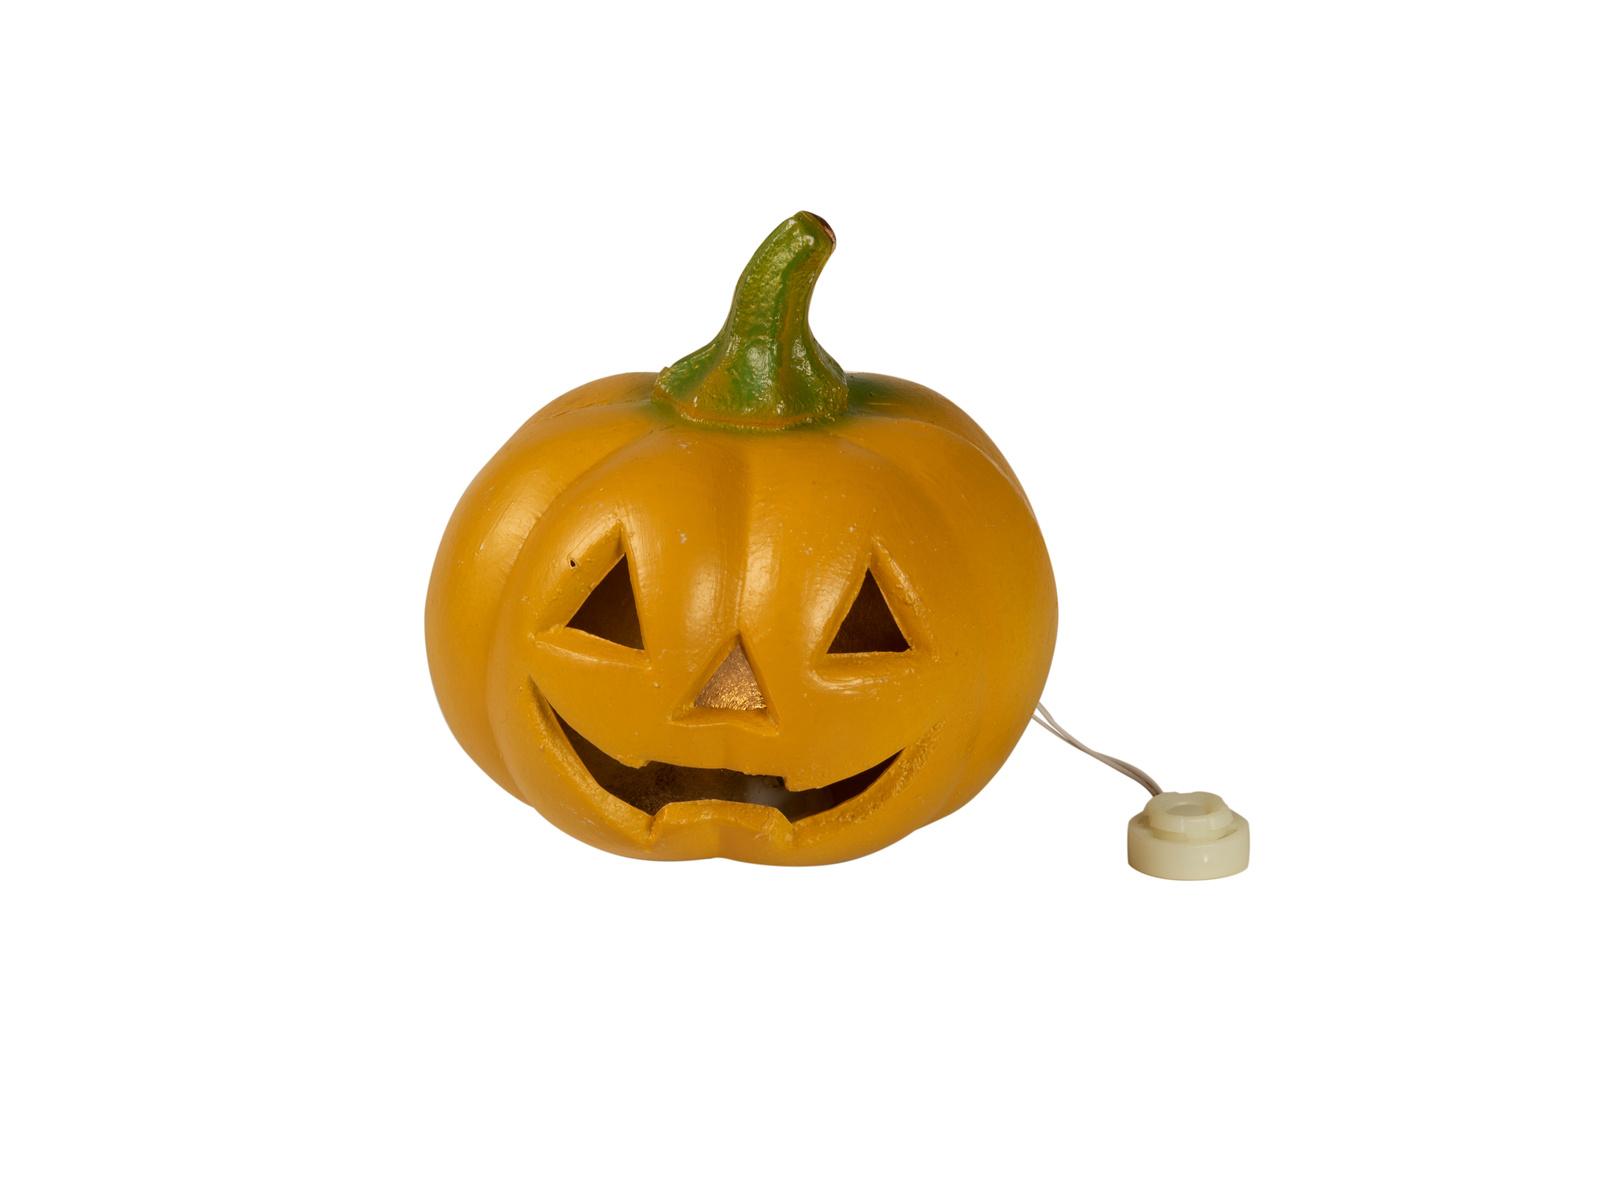 EUROPALMS EUROPALMS Halloween Pumpkin illuminated, 12cm